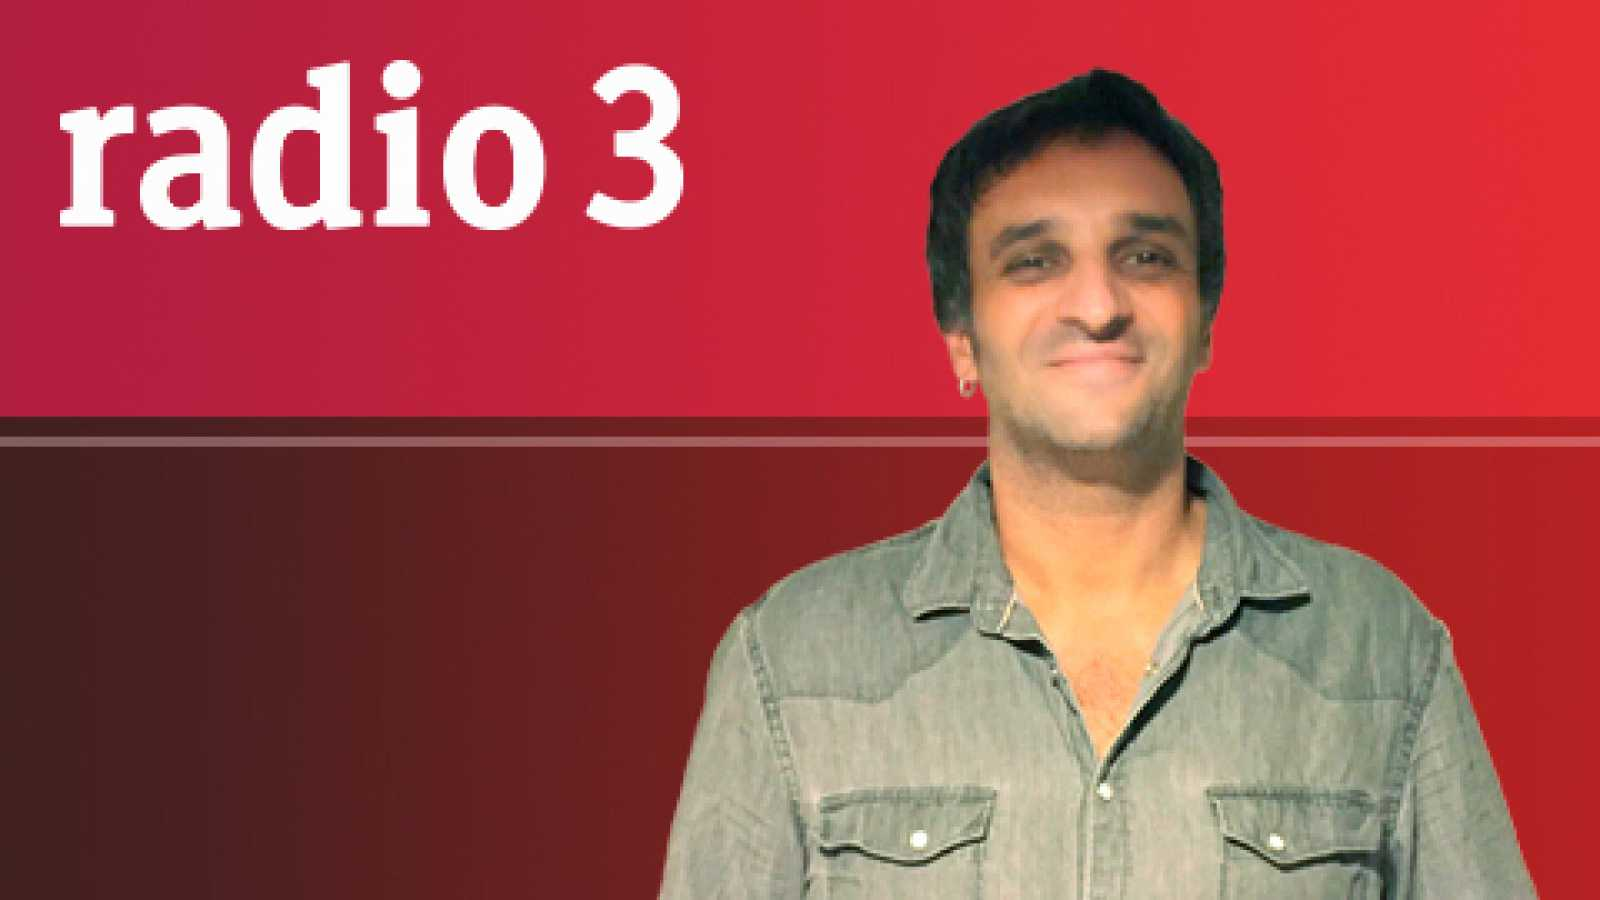 Paralelo 3 - #329 Divorce From New York / Hessle Audio (1) - 09/04/21 - escuchar ahora